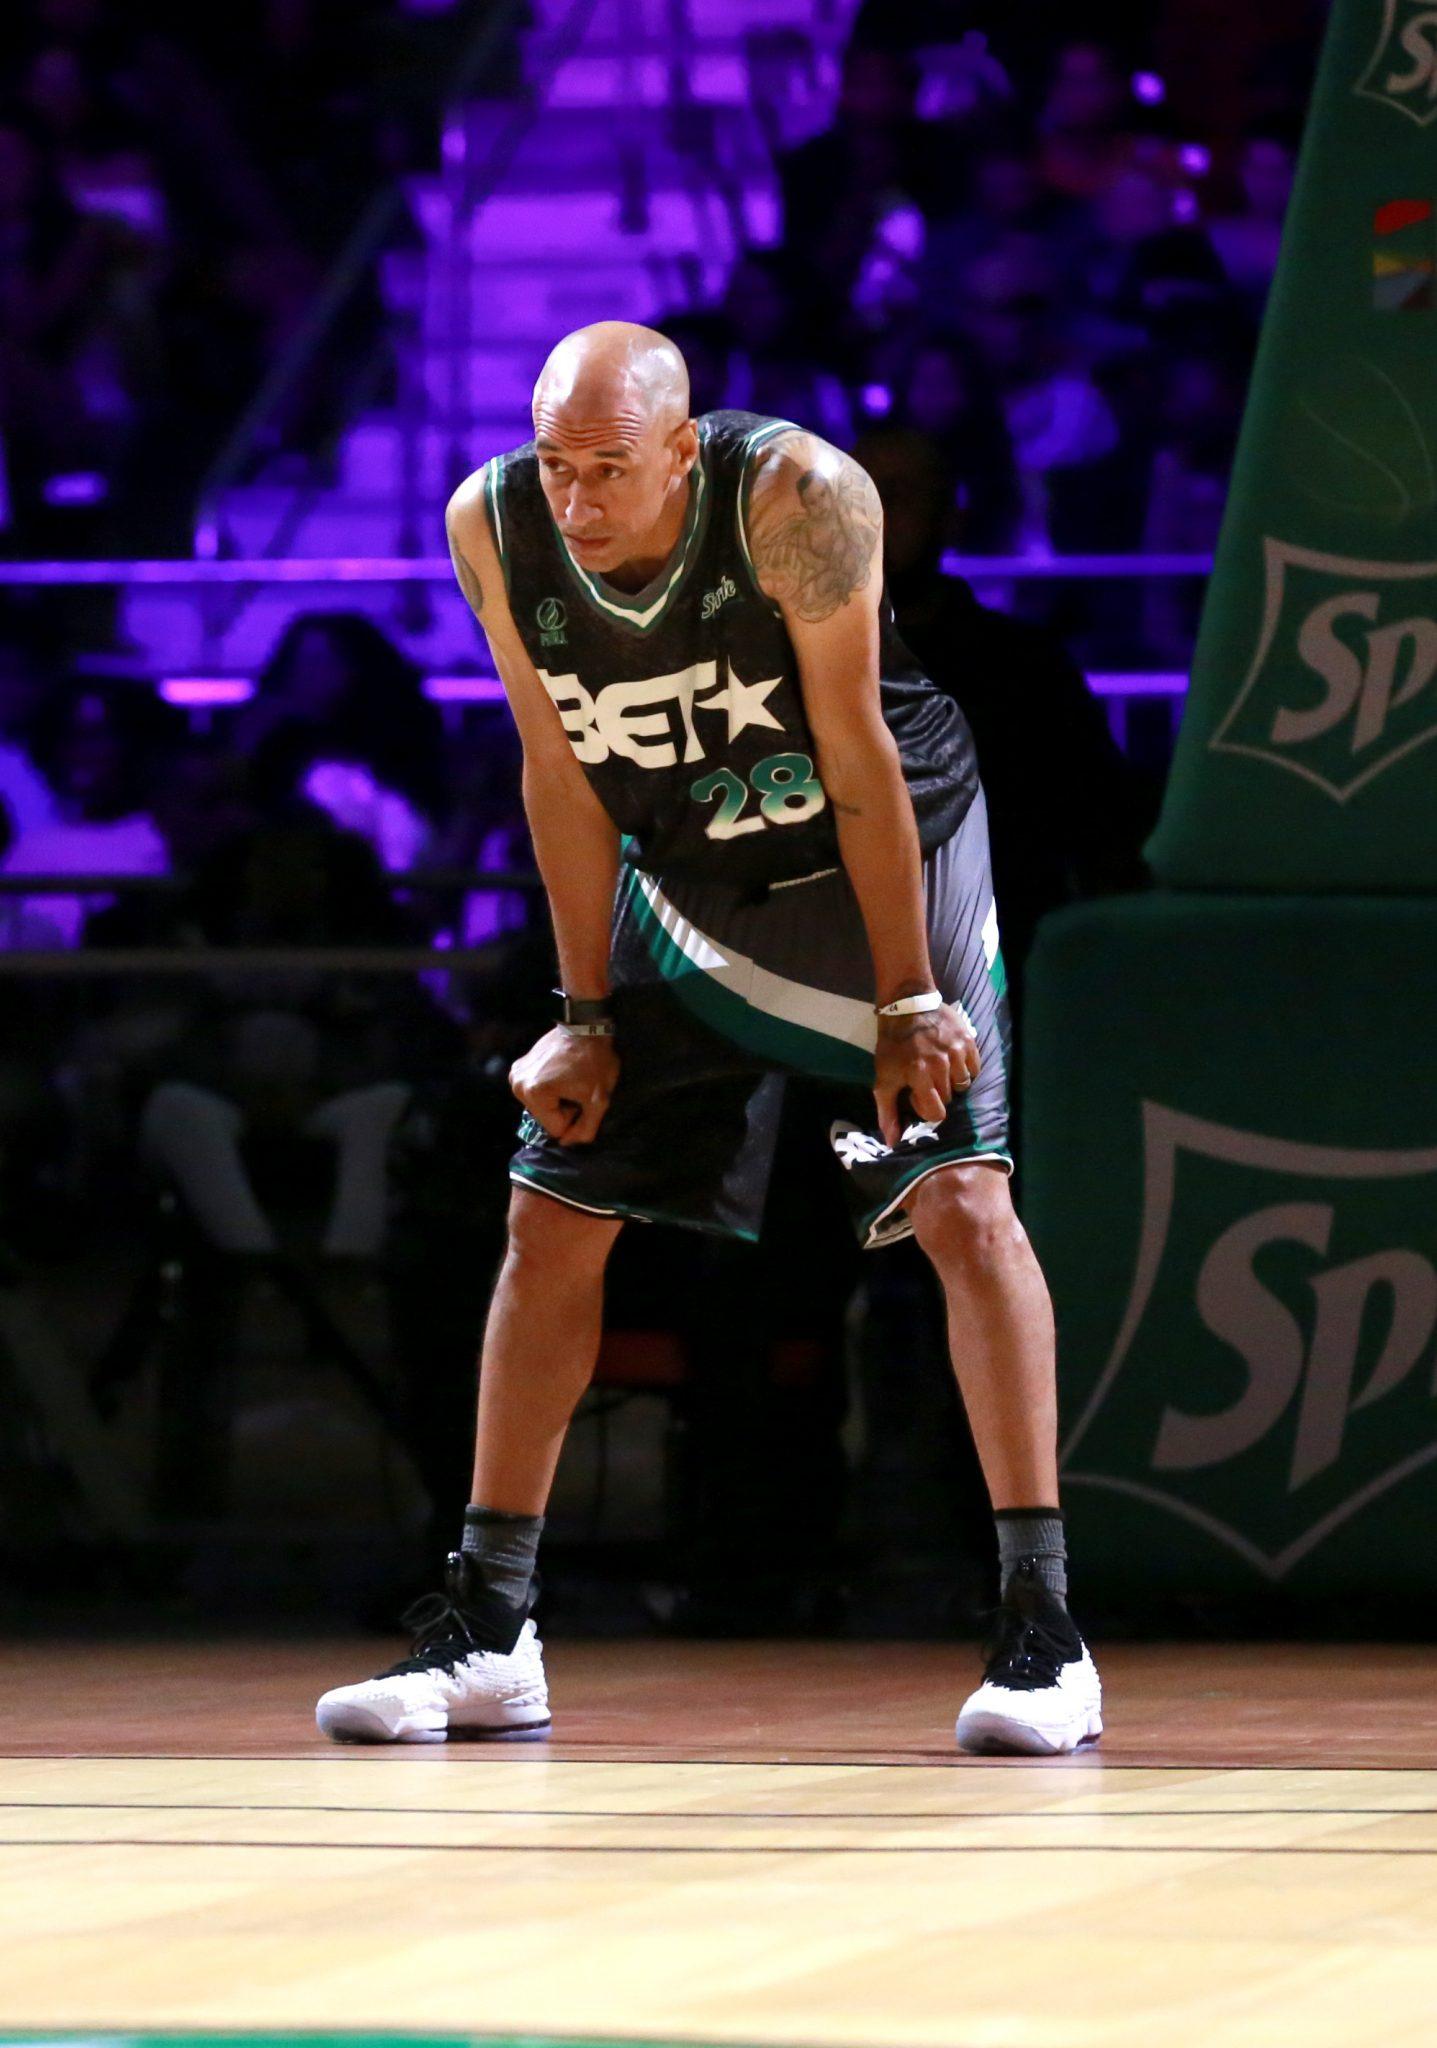 bet celebrity basketball game 2018